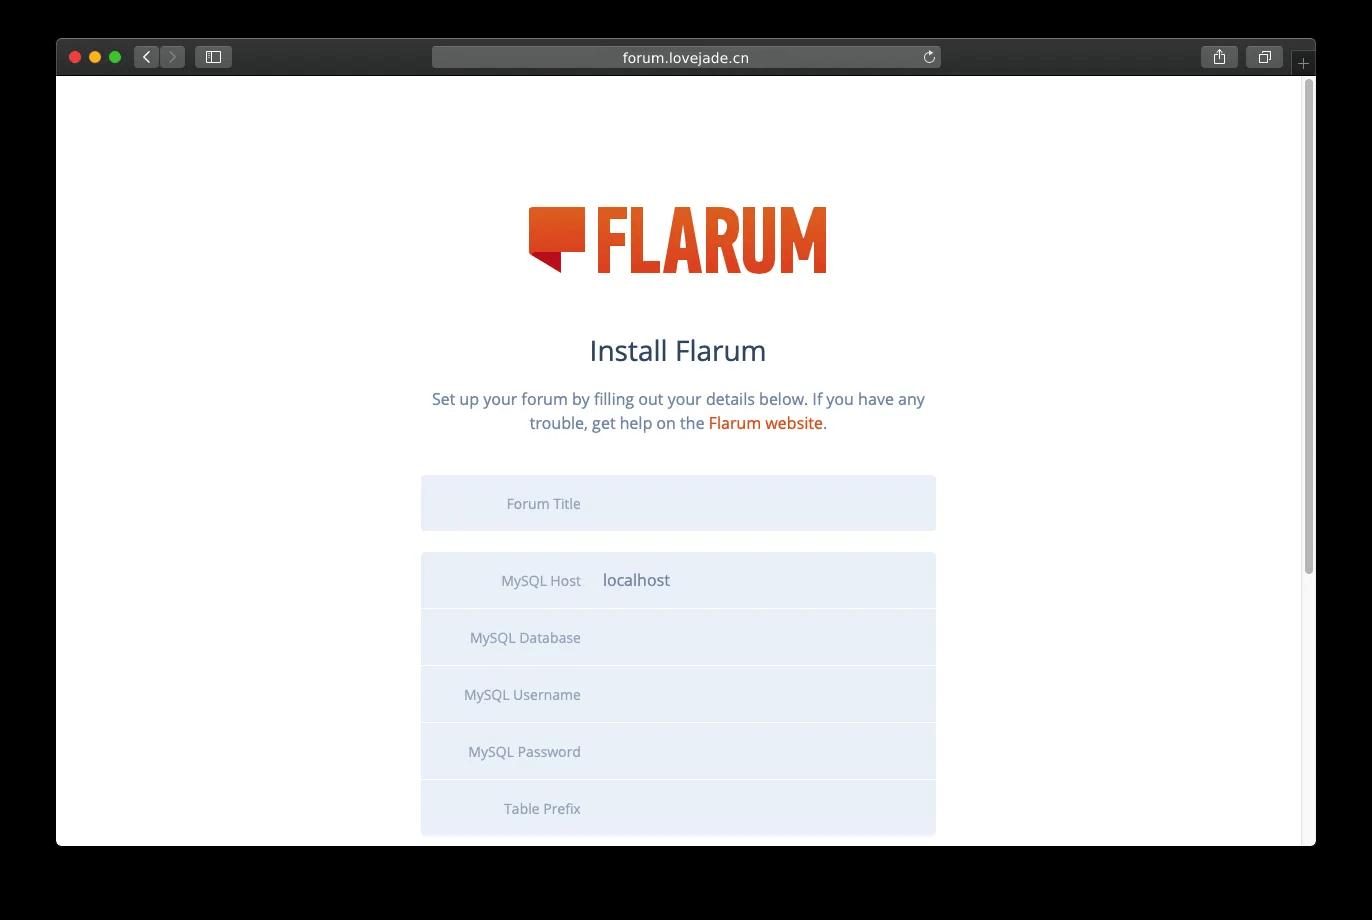 Flarum Install